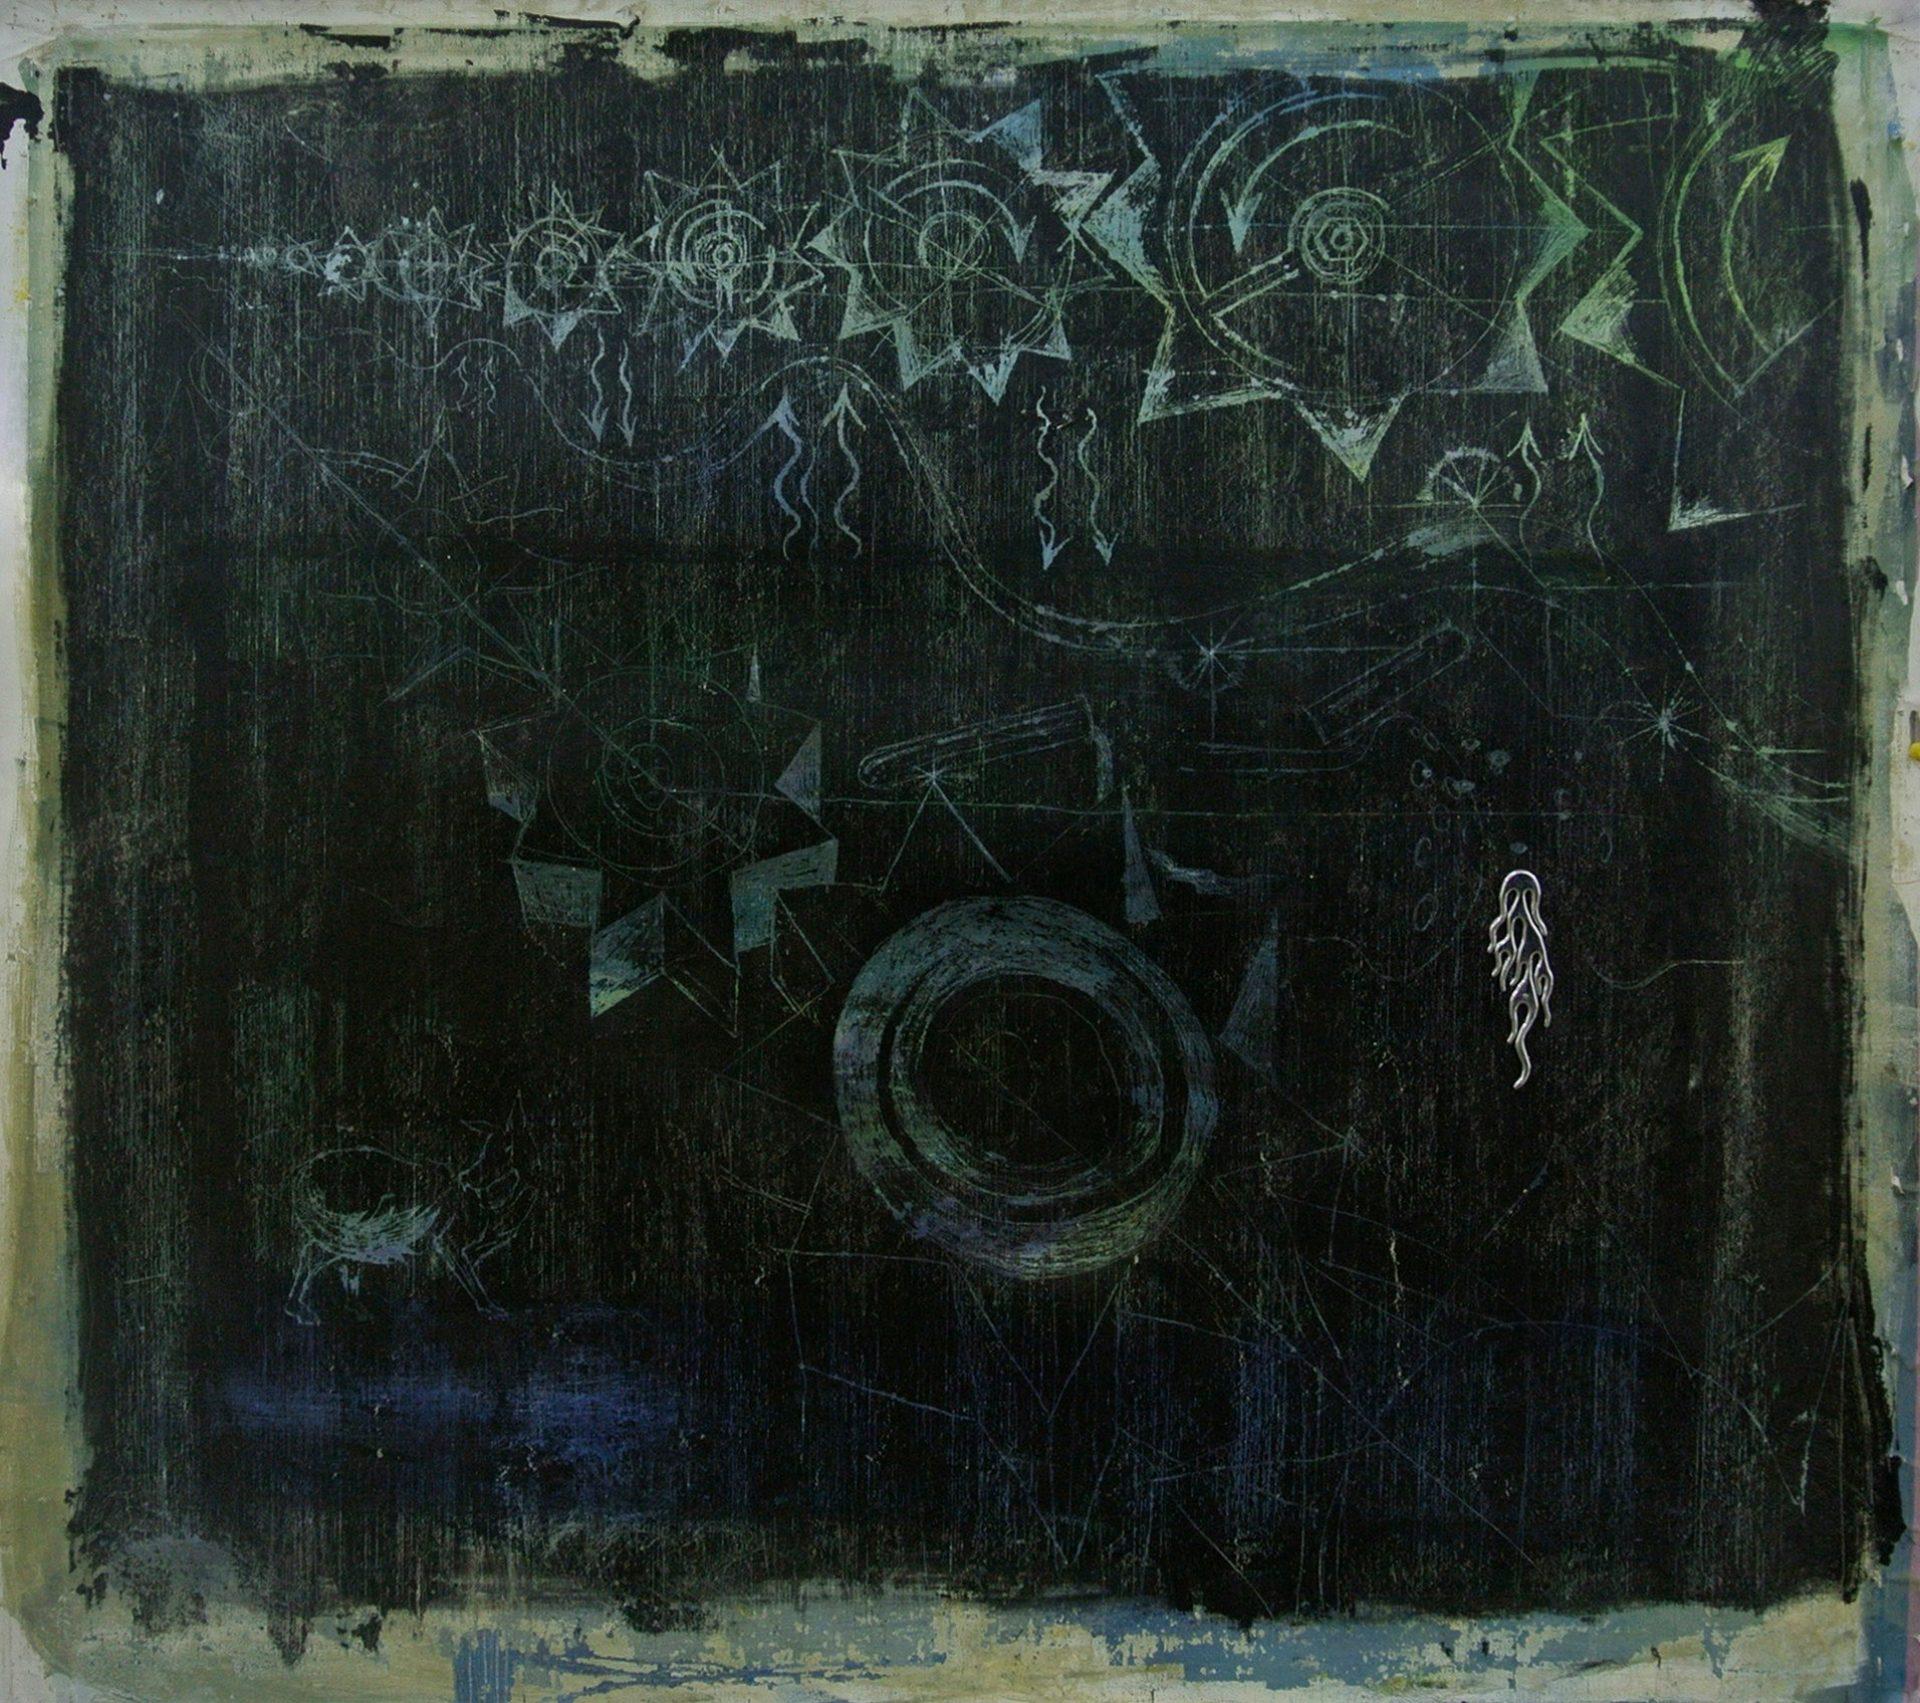 Hortensia Mi Kafchin, Study for Ouroboros, 2014